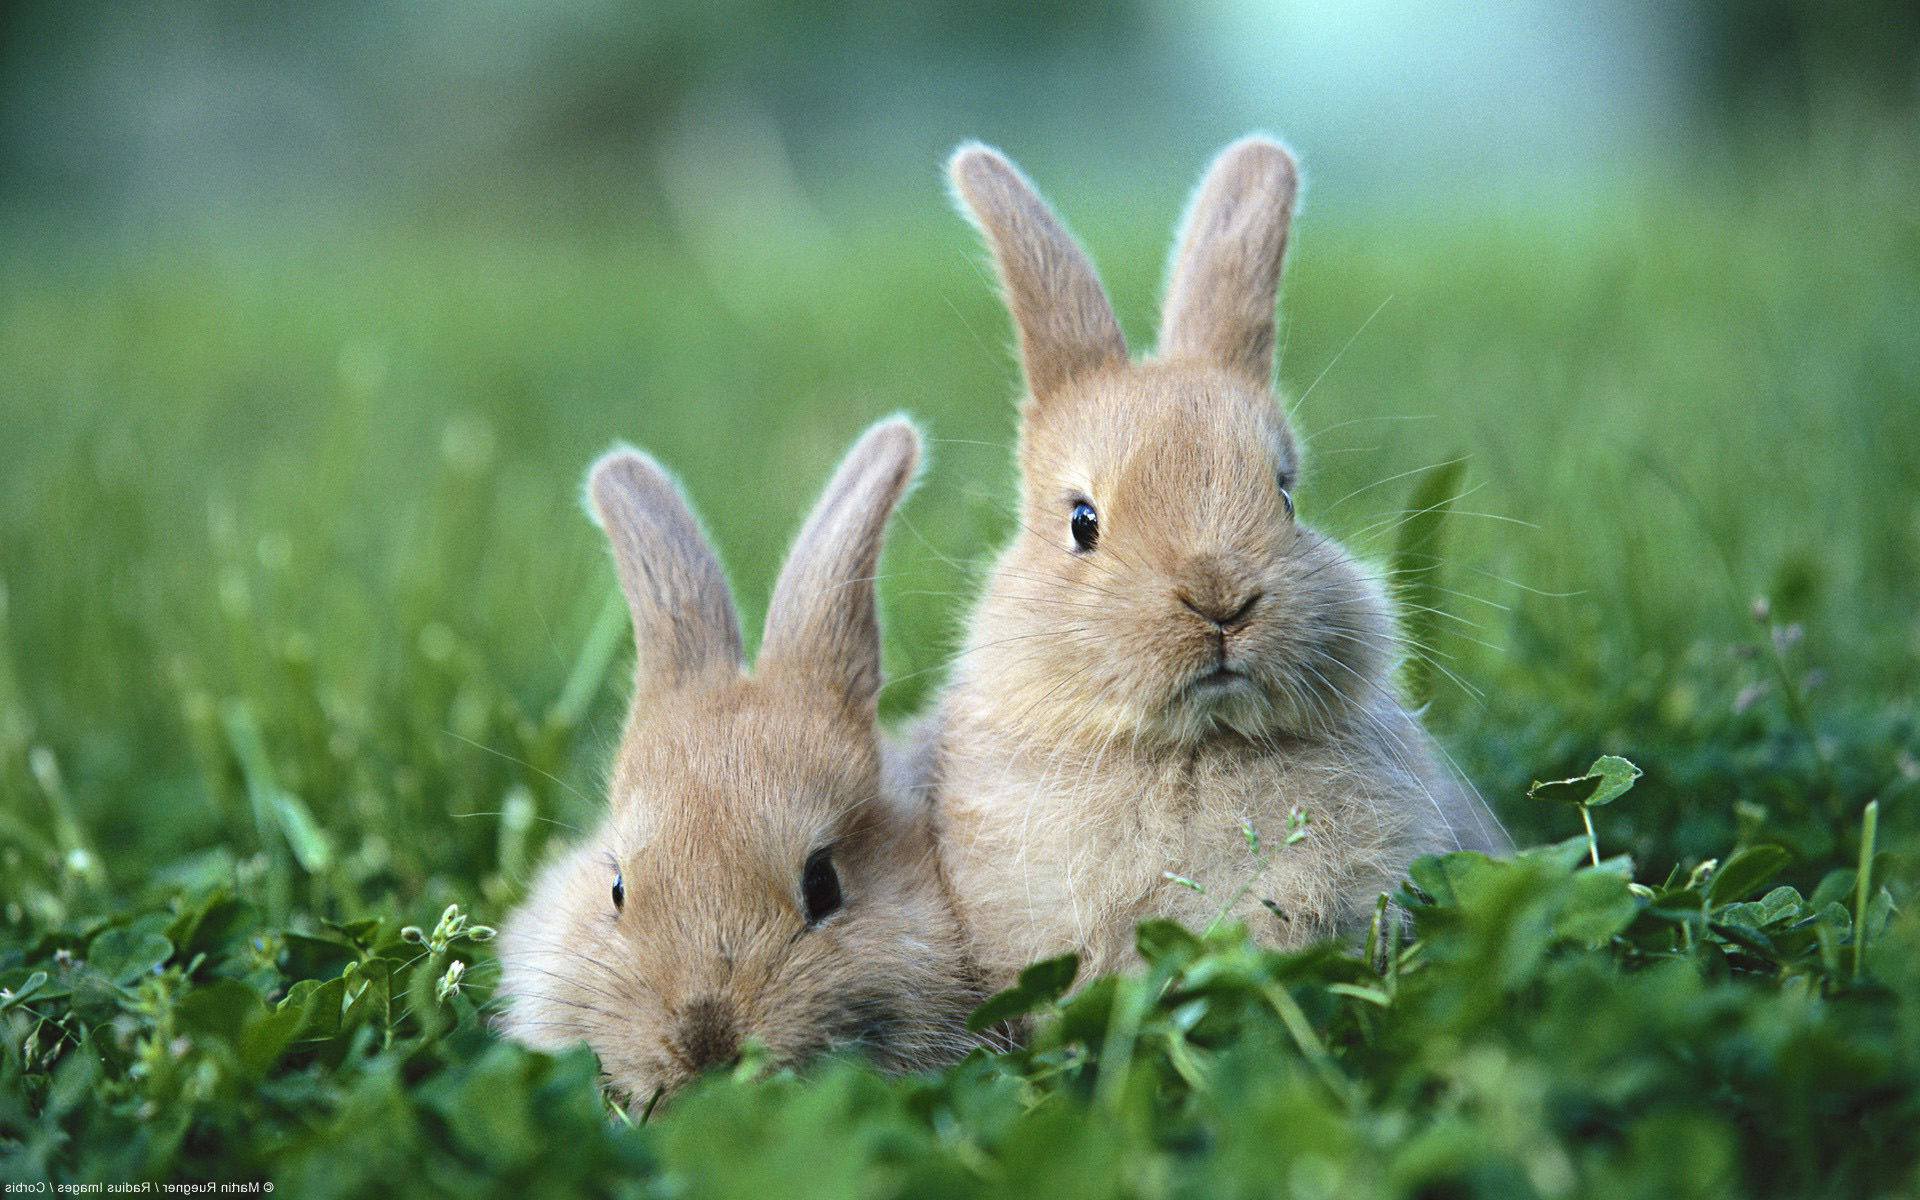 Two rabbits photo